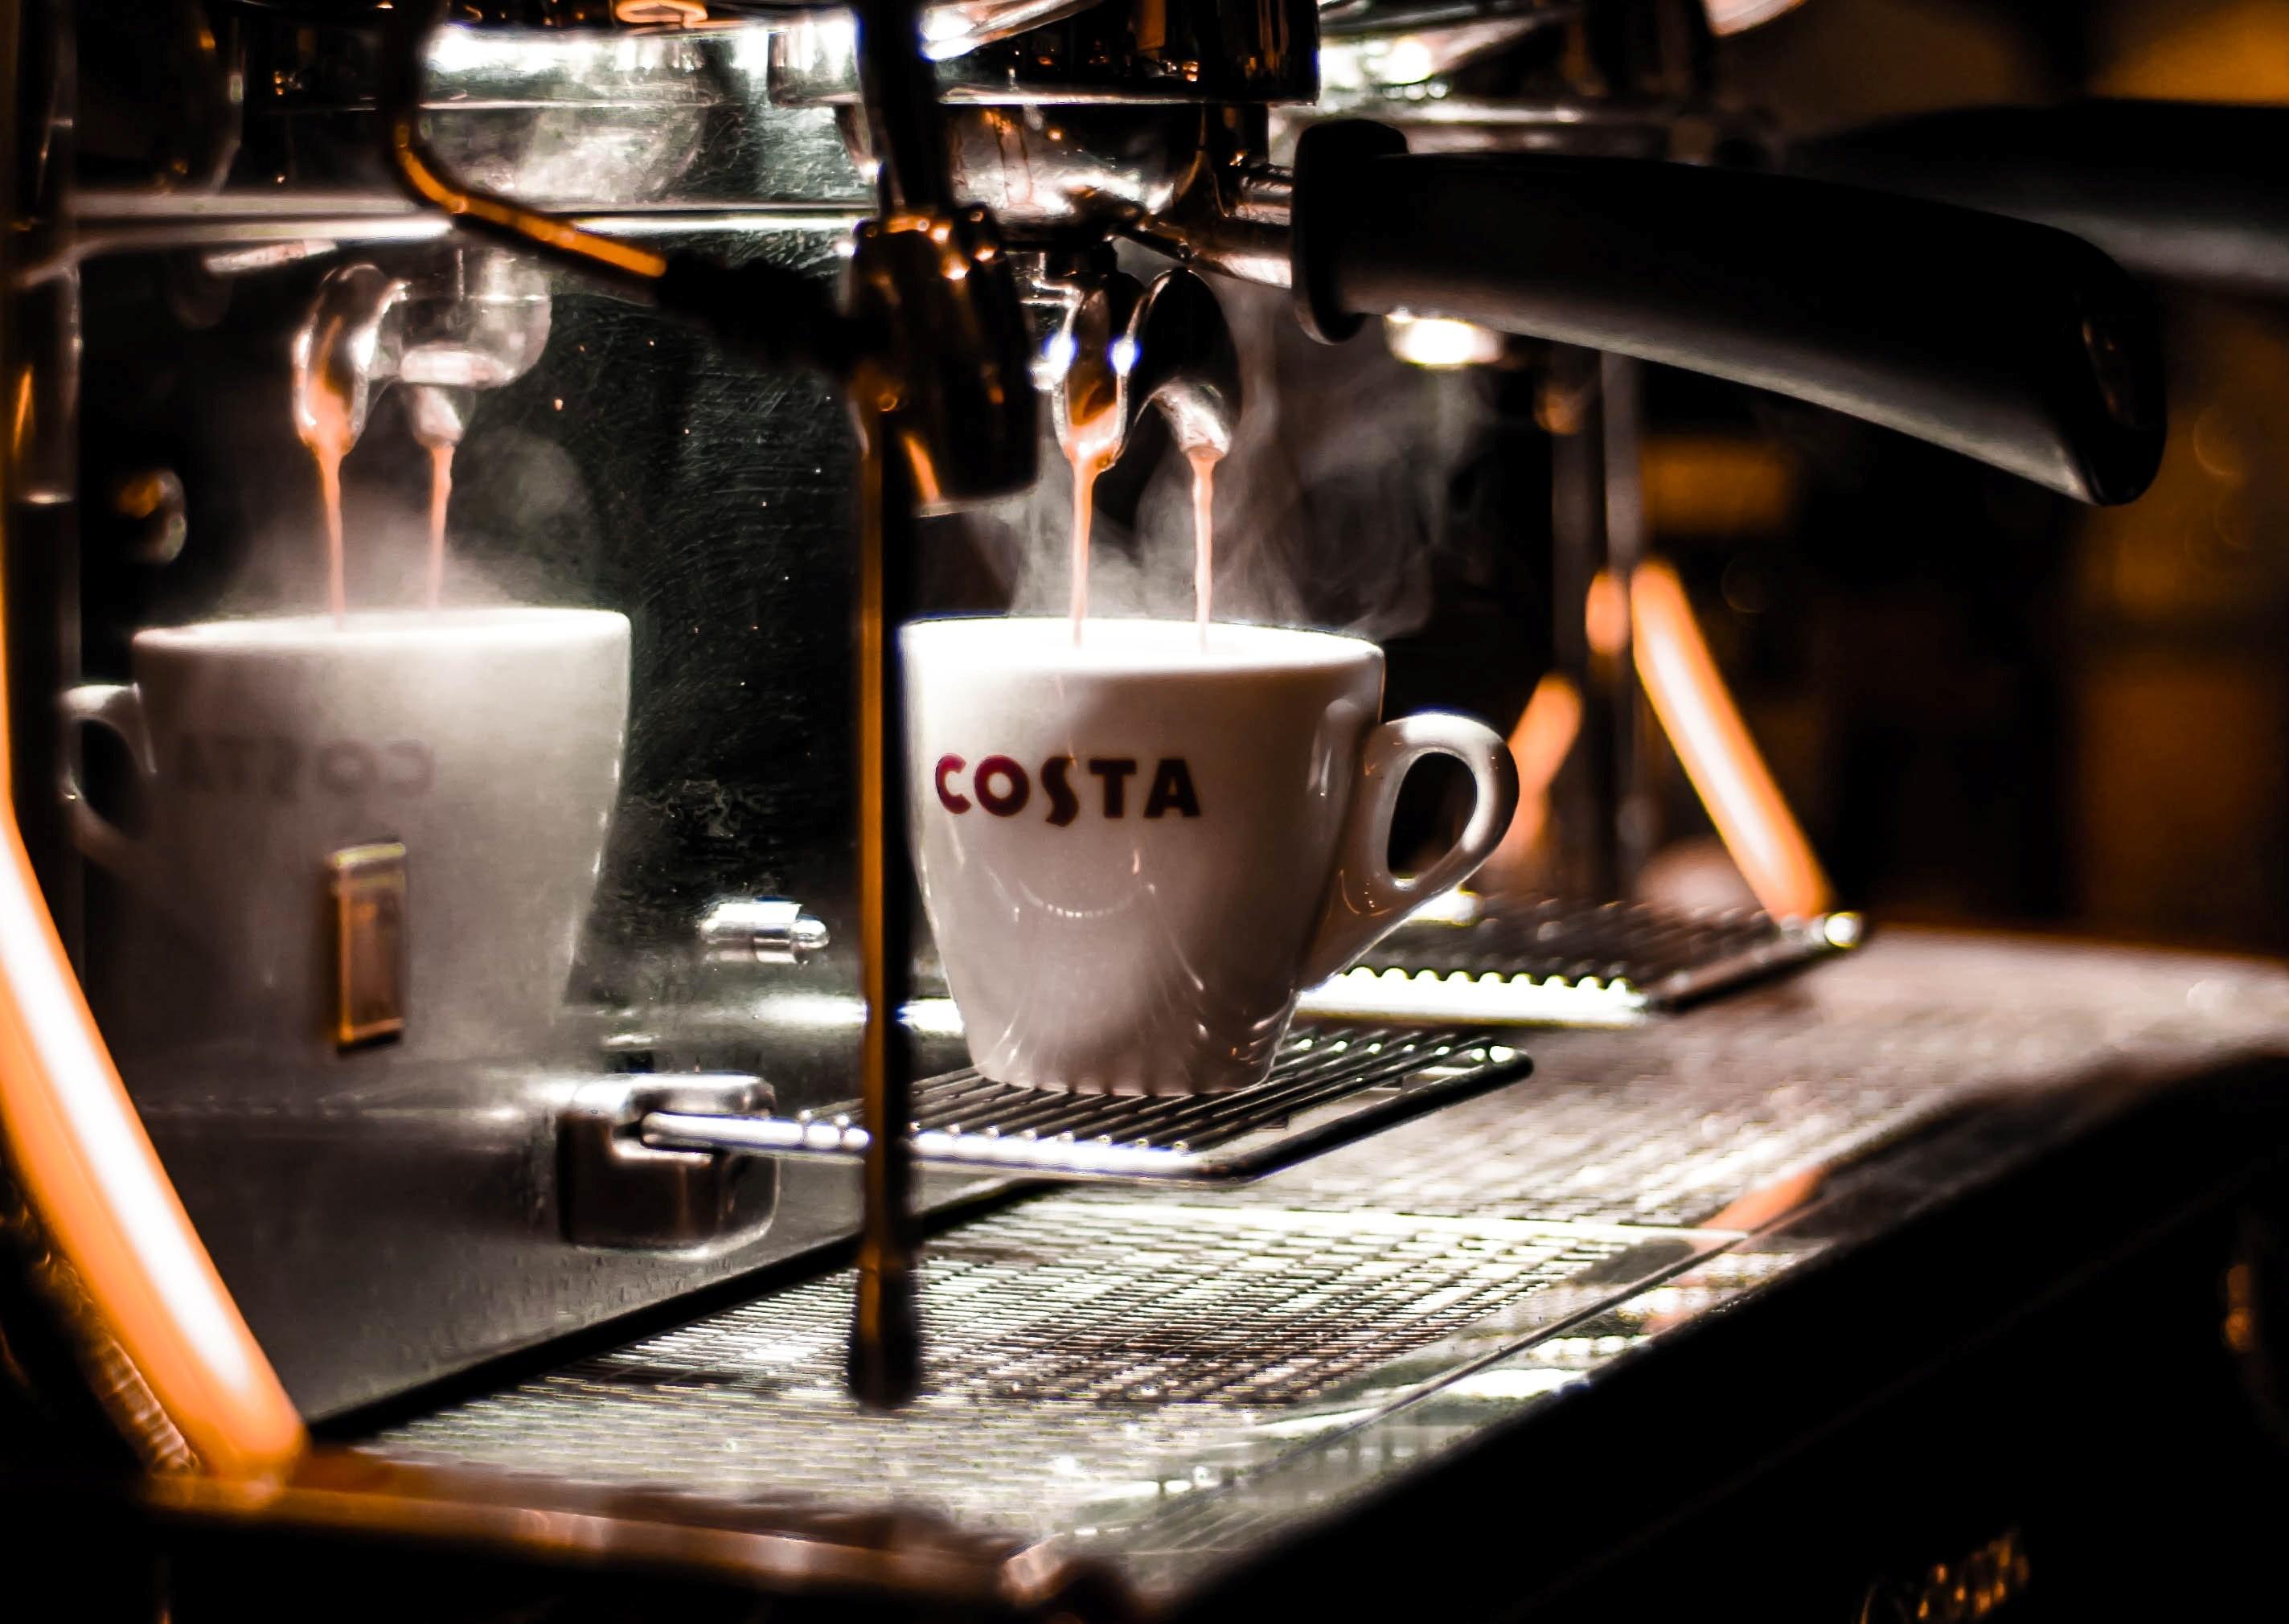 costa_coffee.jpg